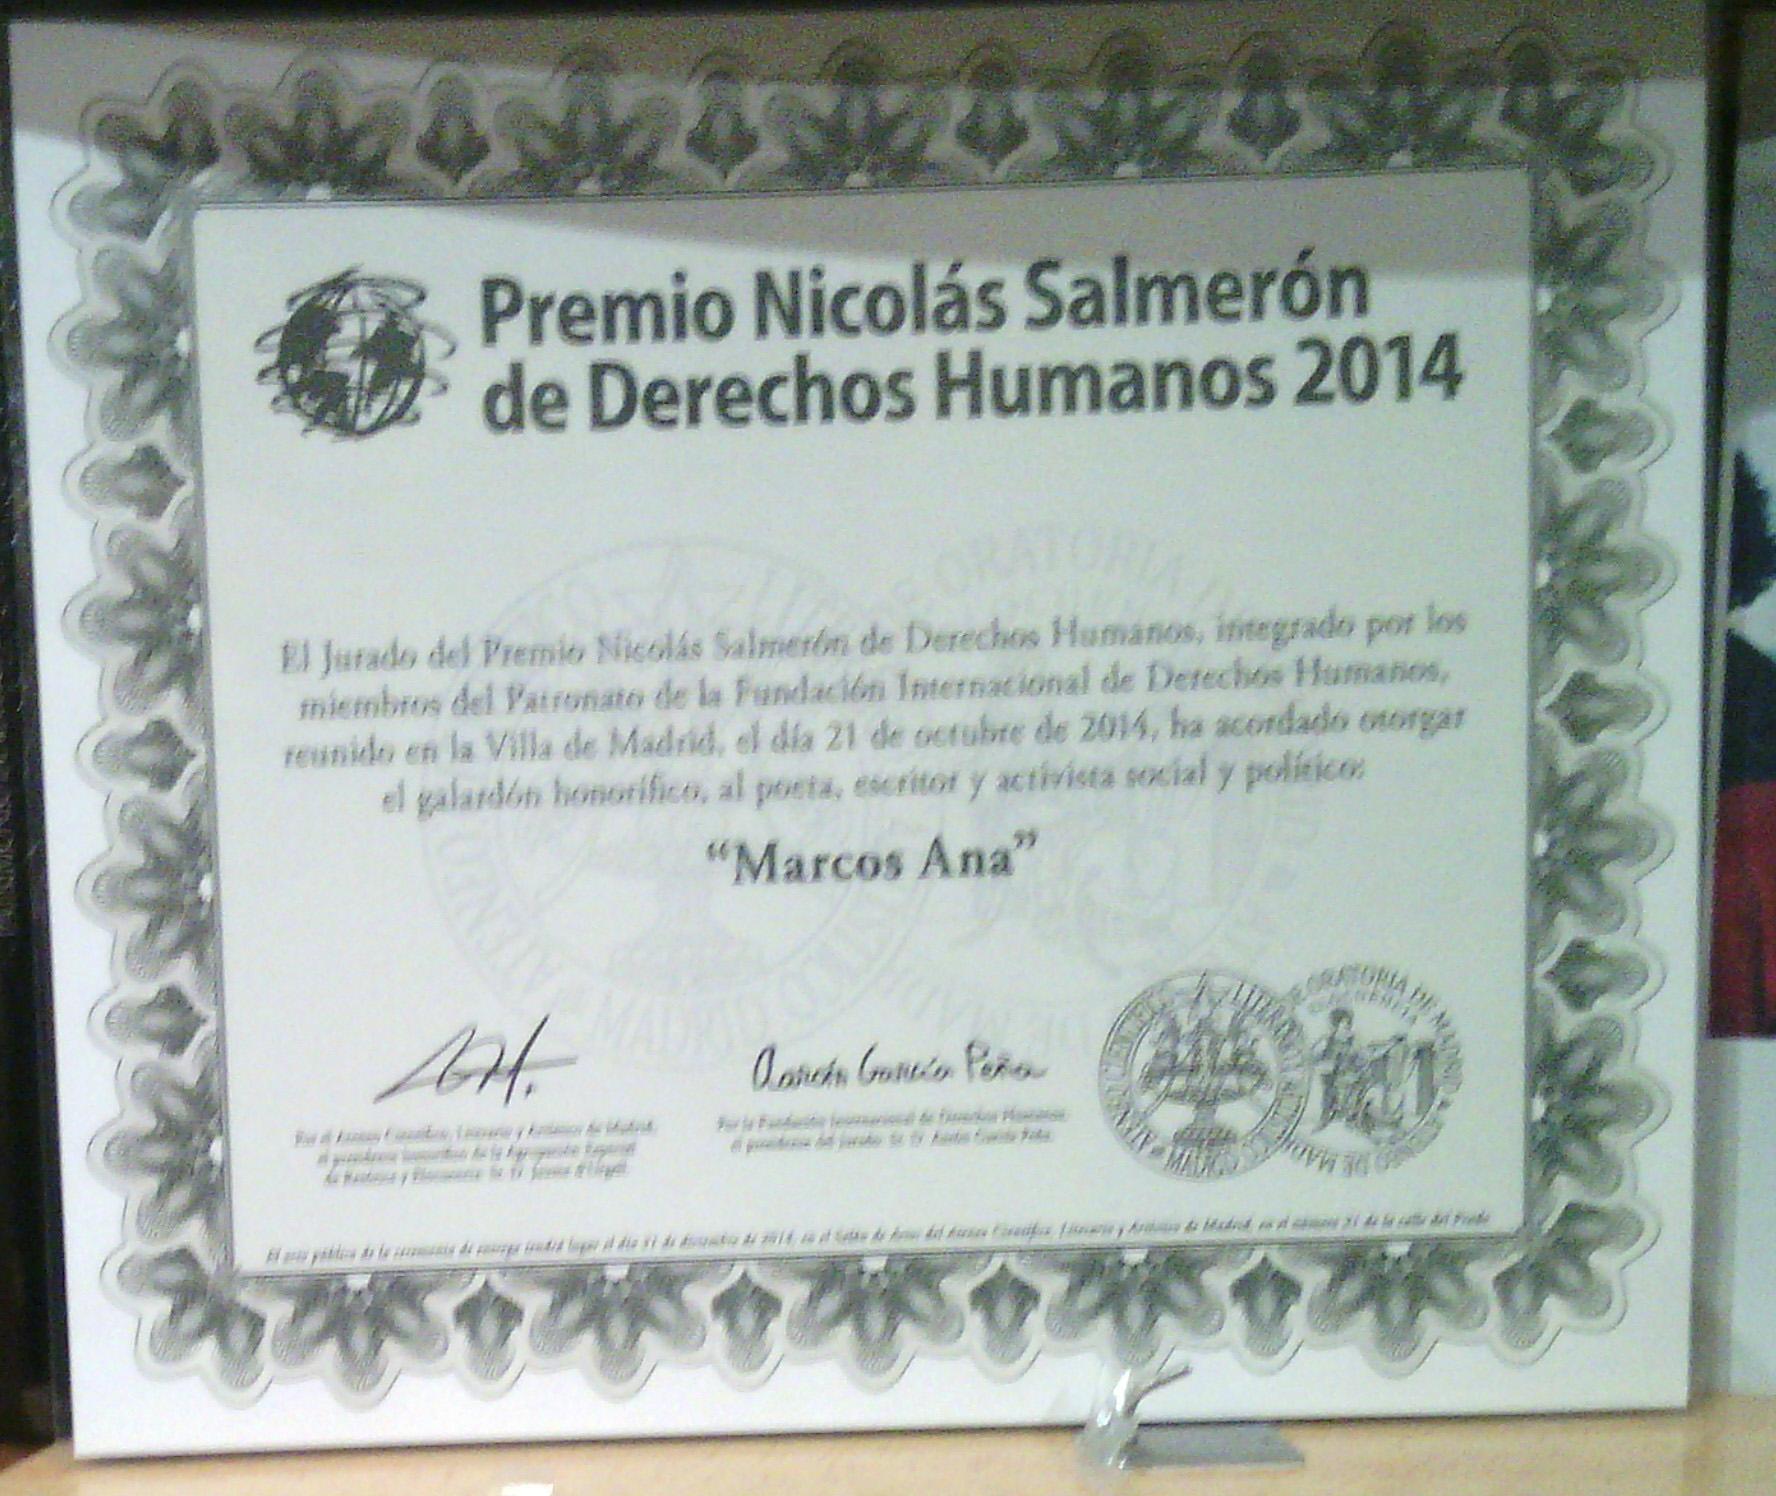 MARCOS ANA - NICOLAS SALMERON